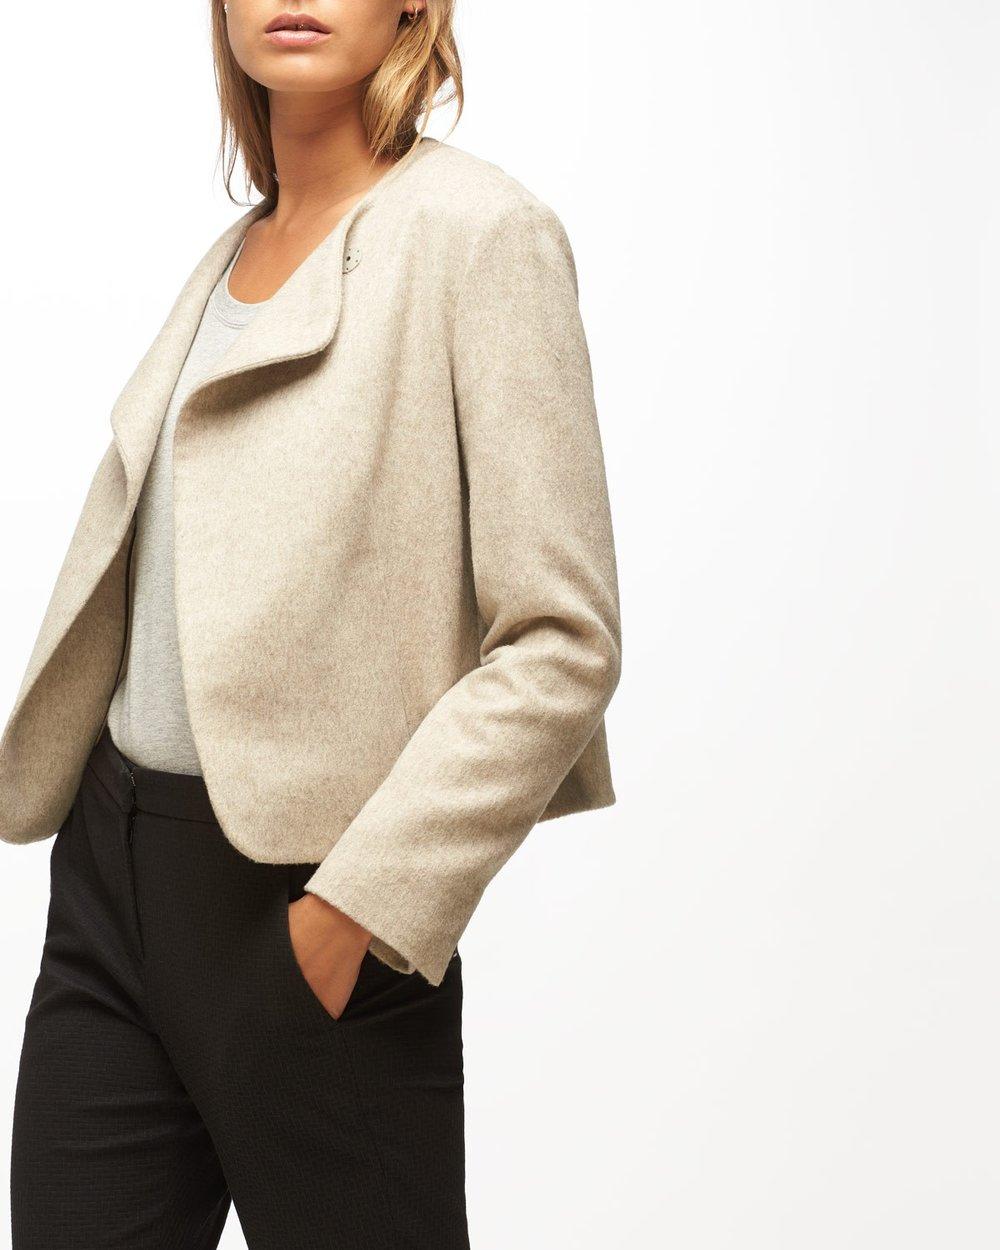 Jigsaw Wool Jacket